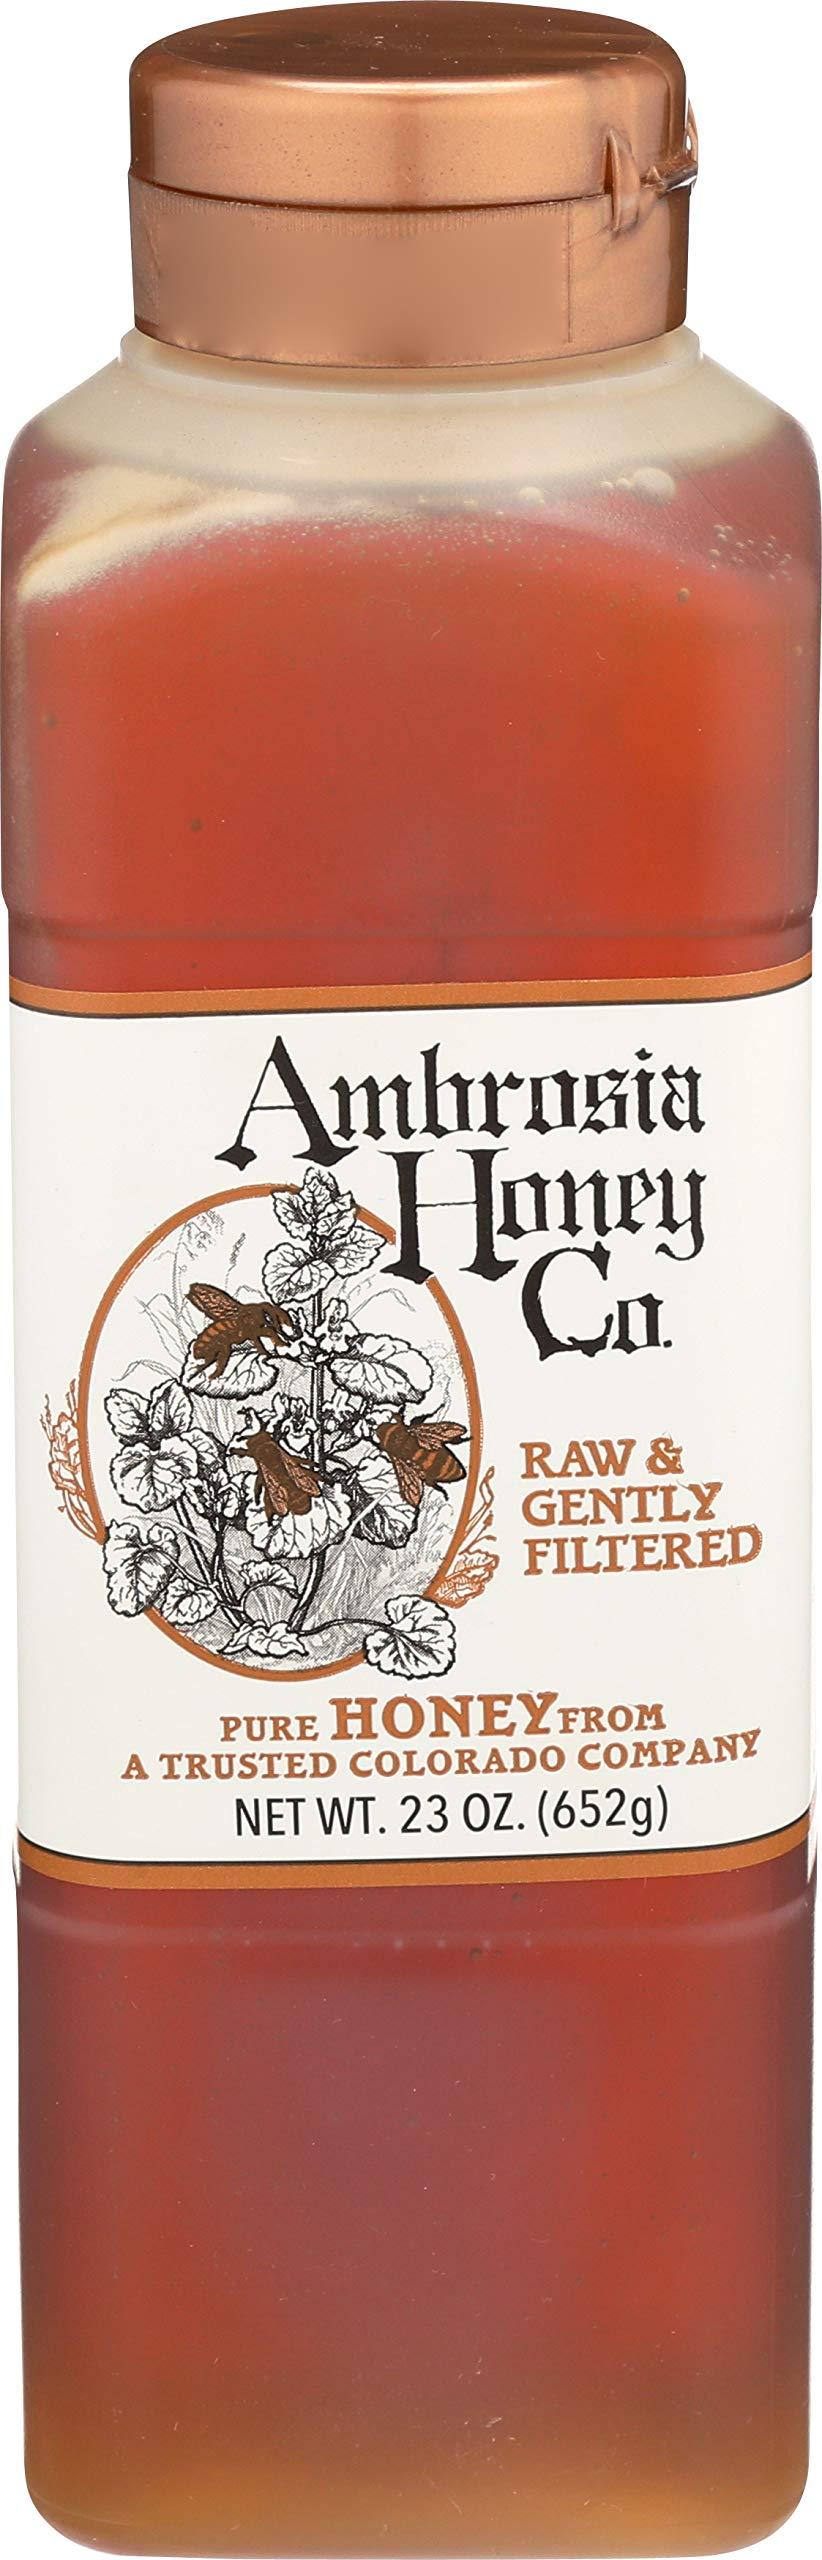 AMBROSIA HONEY CO. Gently Strained Honey, 23 oz. Bottle (Pack of 4) | Natural Sweetener, Sugar Alternative | 100% Pure Honey | US Honey | Liquid Sweetener